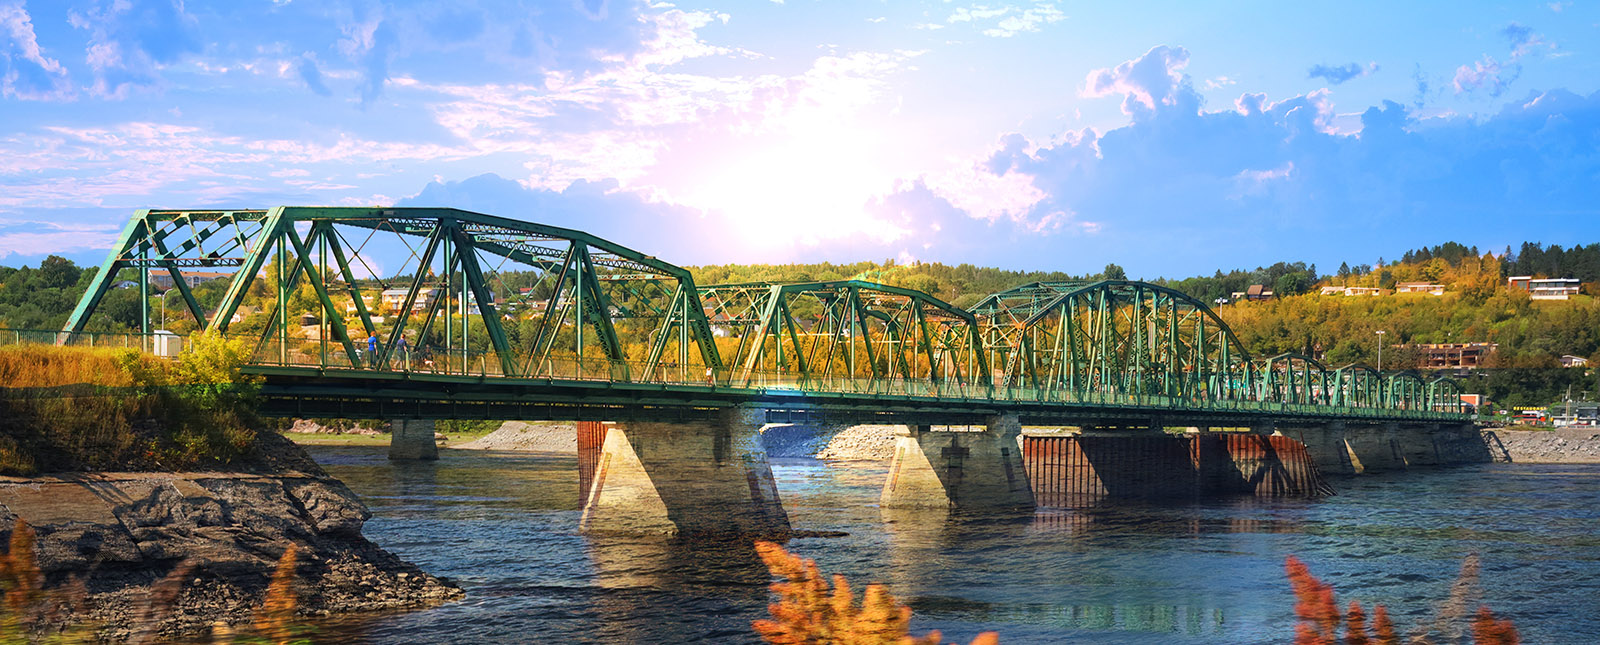 Old Saguenay Bridge and River - Stock Photography